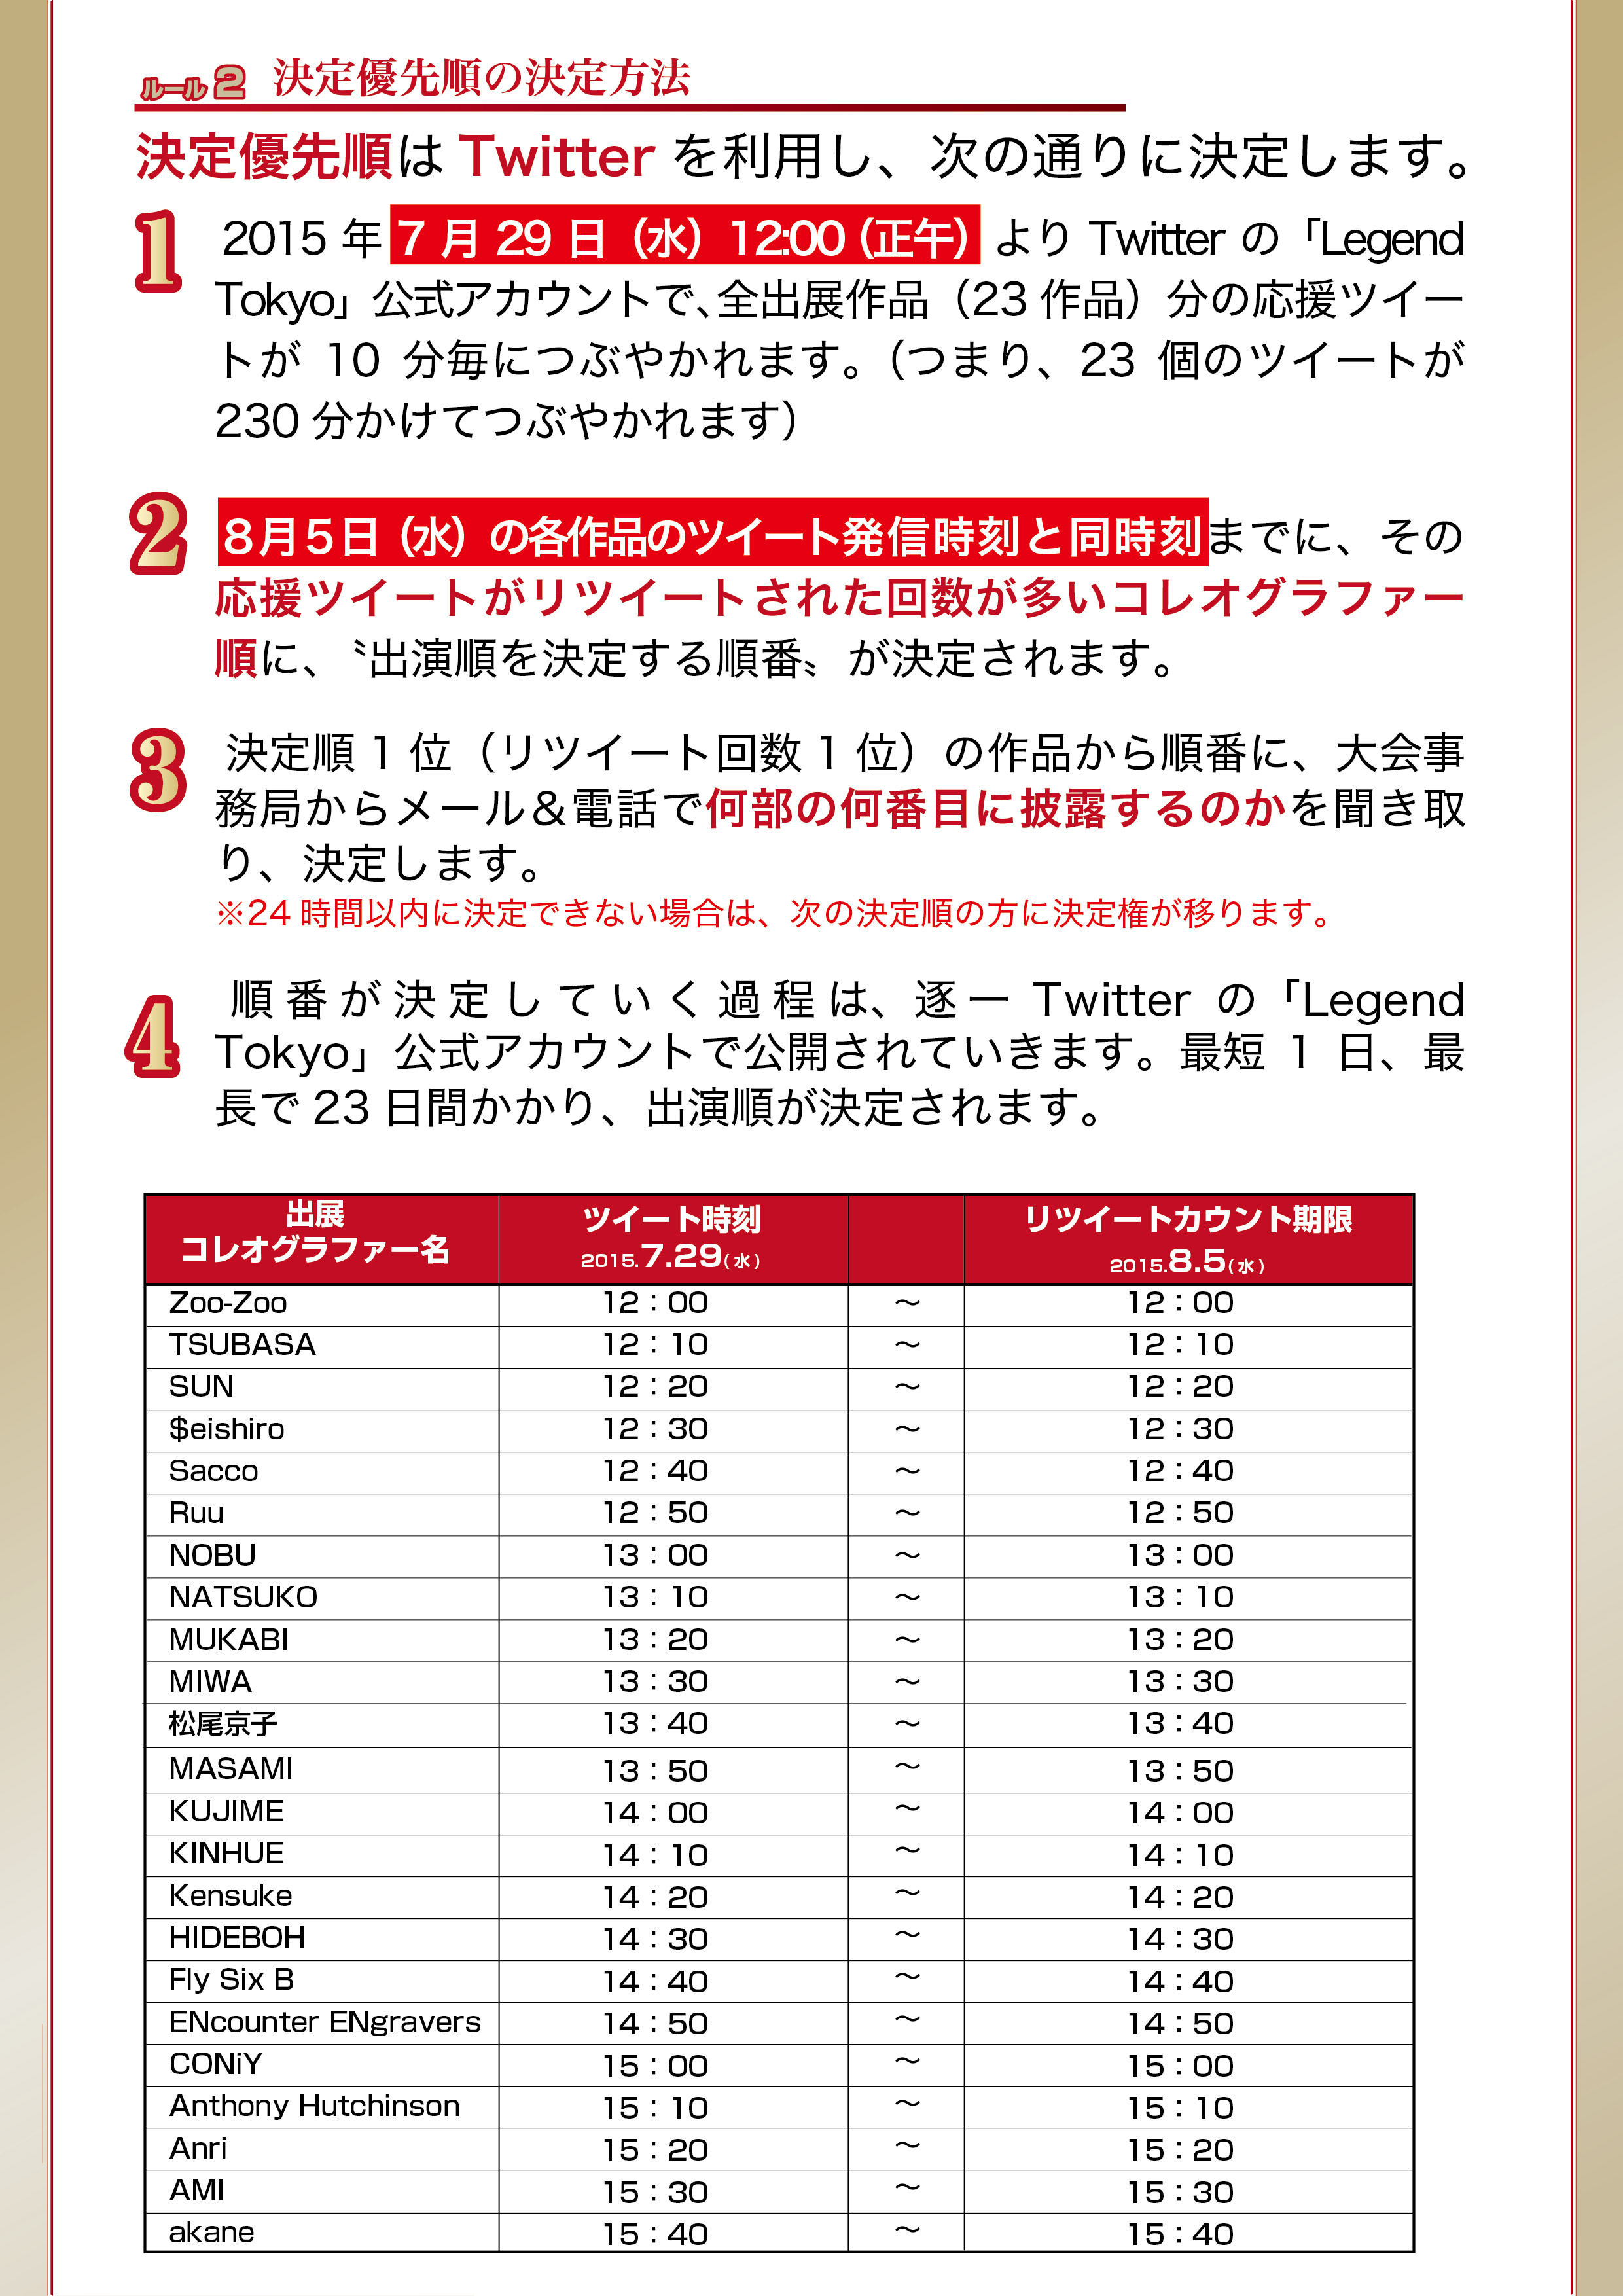 LT5香盤おしらせweb用new-02